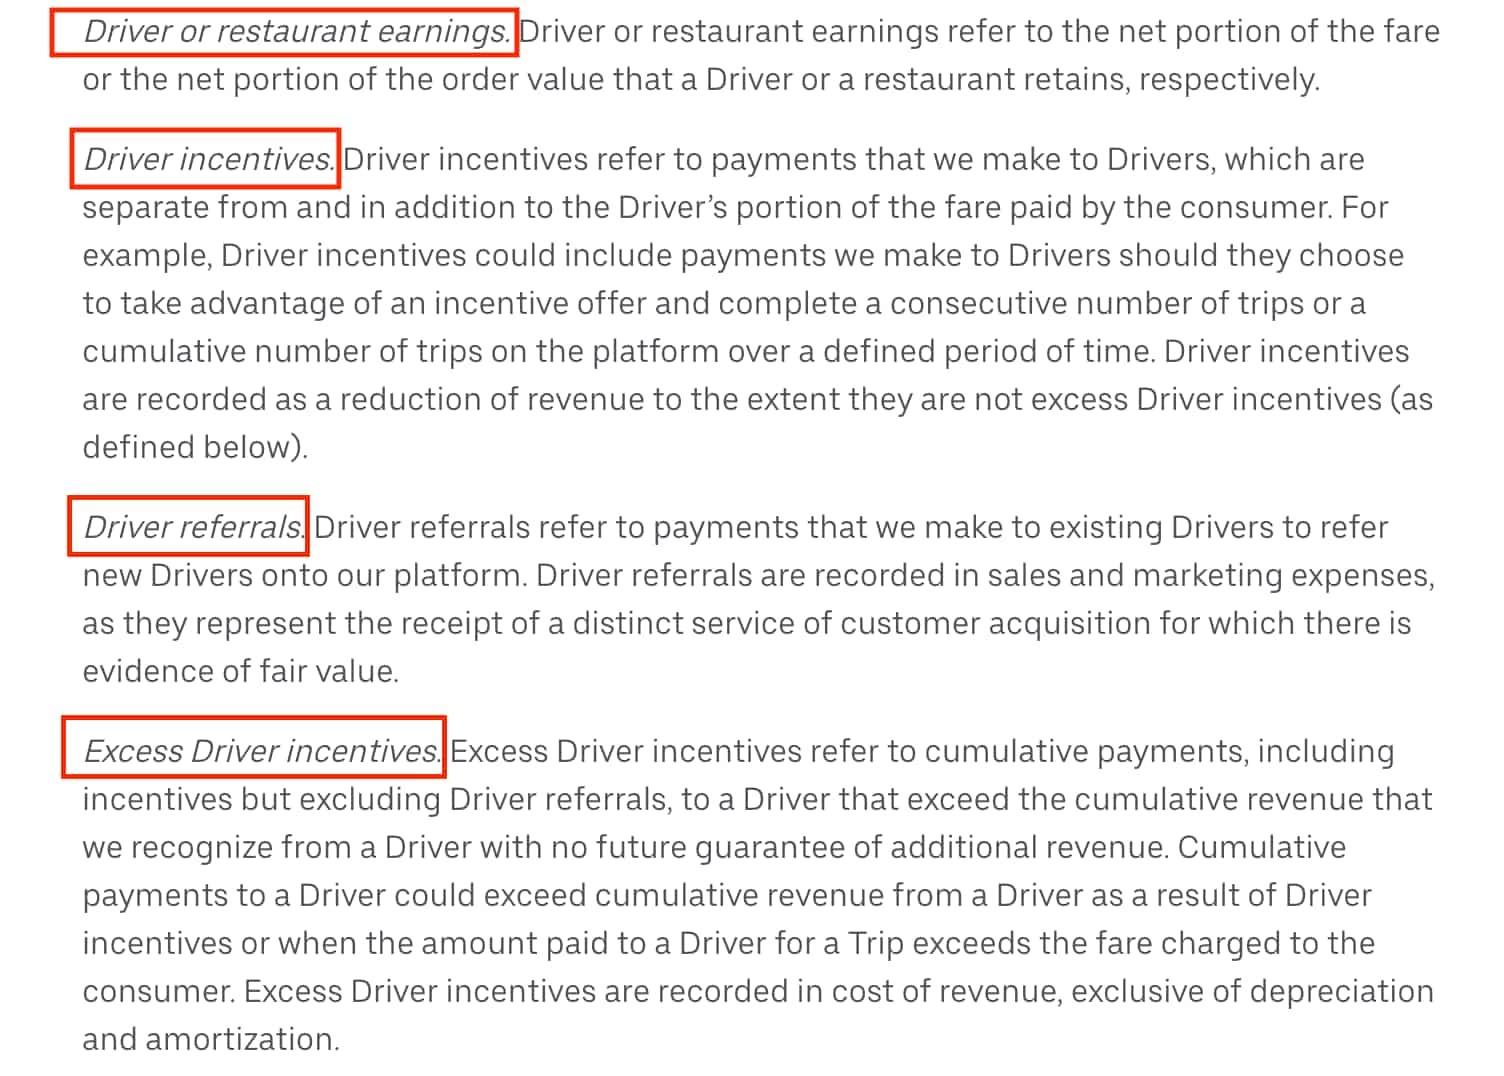 Uber Eats Dubai driver incentives